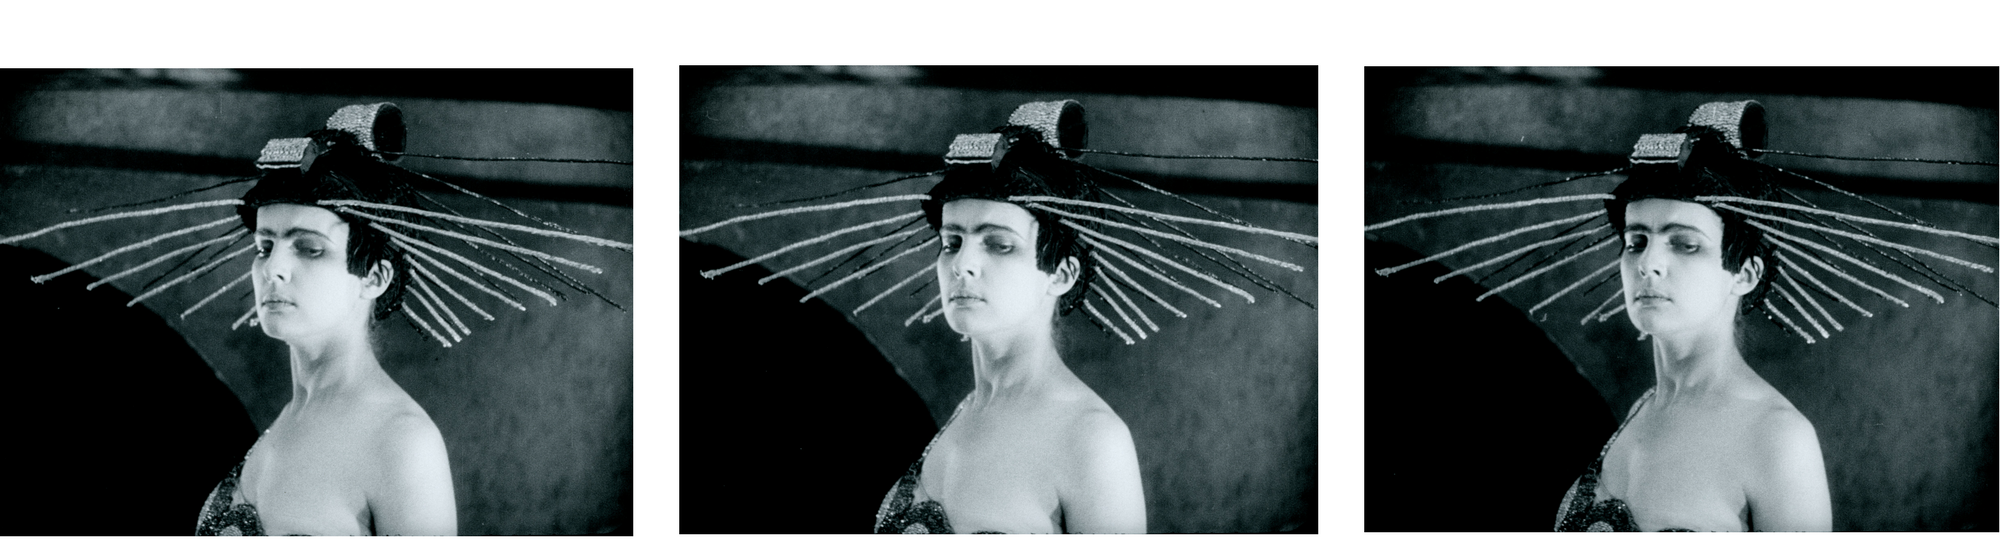 Fotos © Kinostudija im. M. Gorkogo